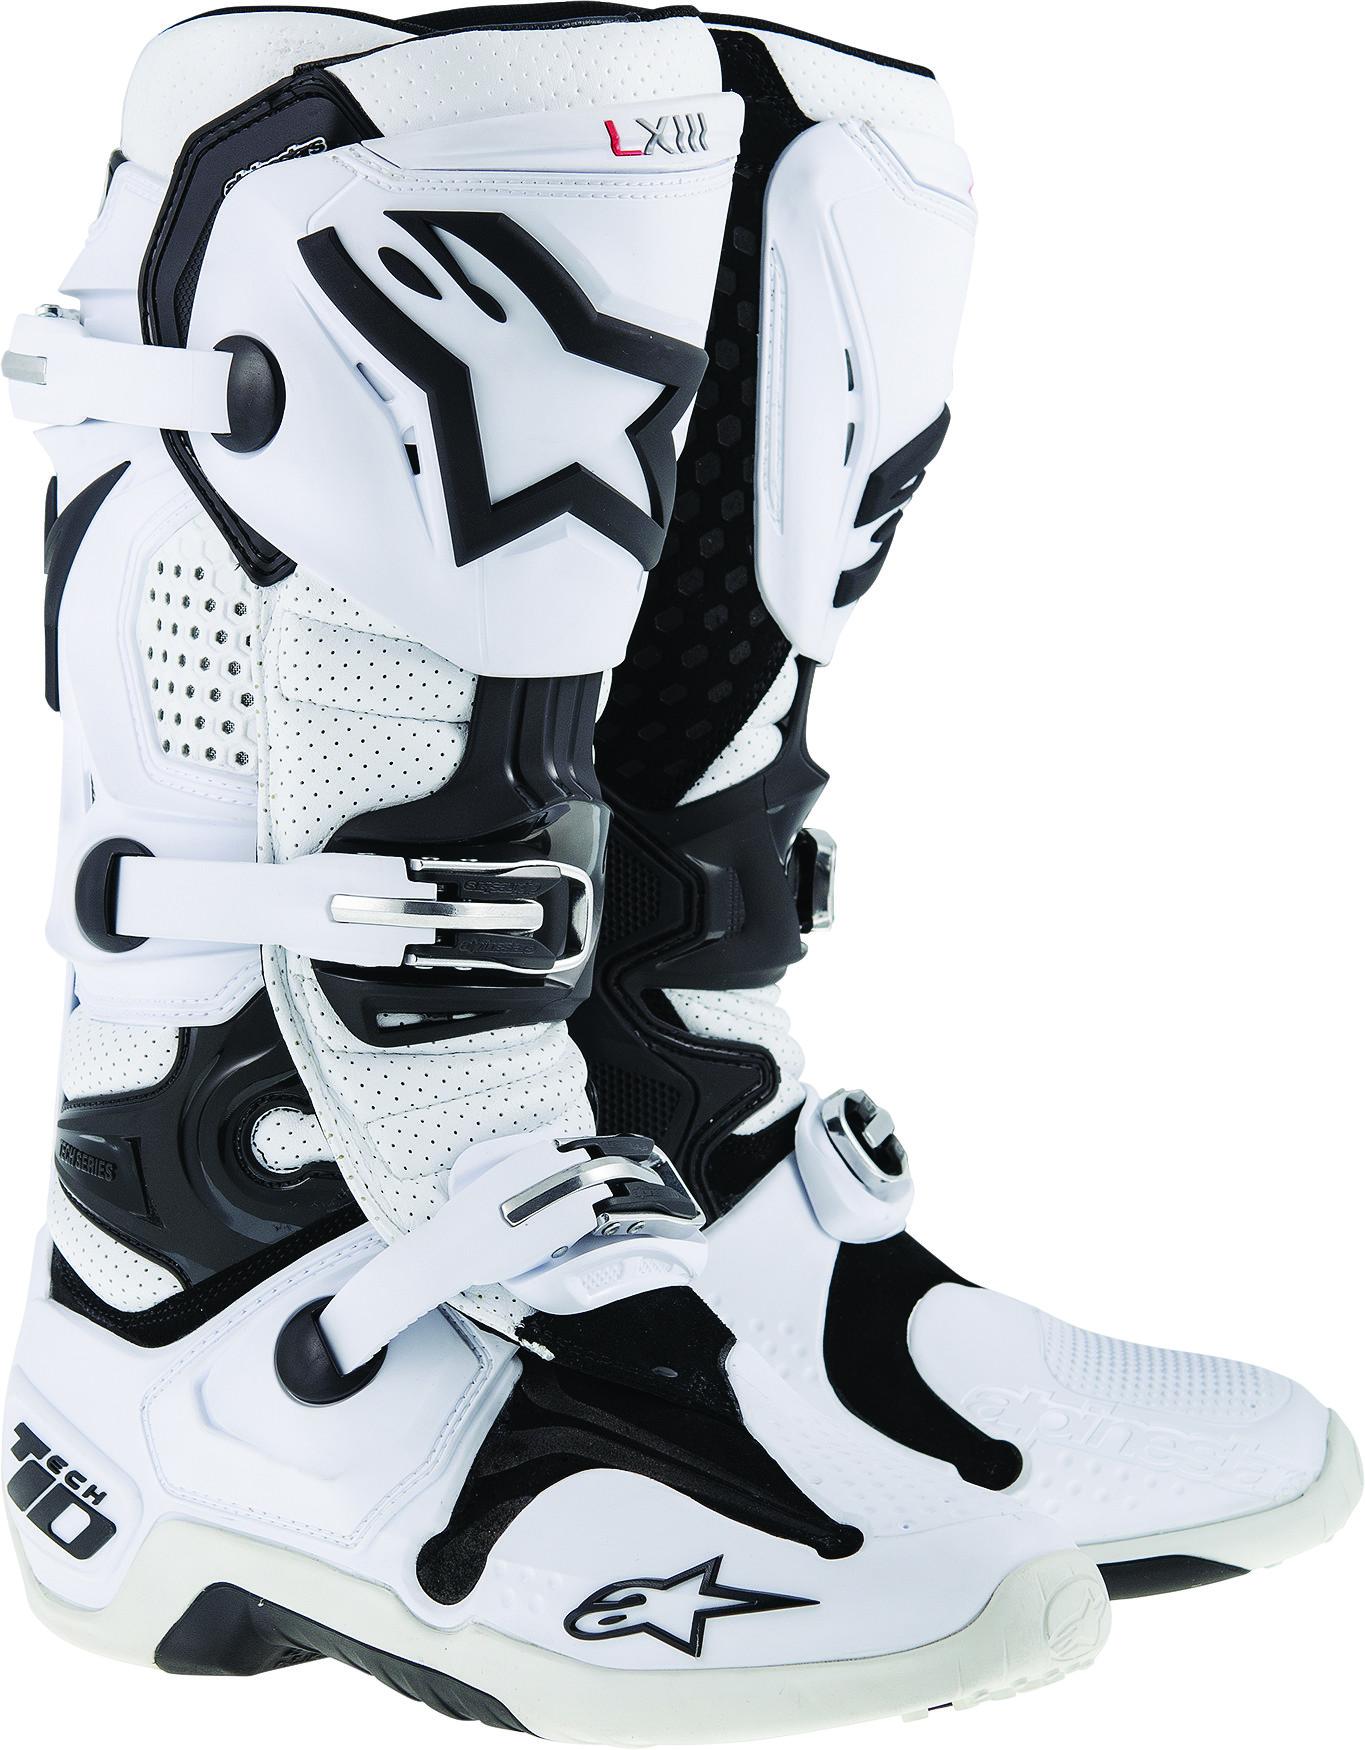 Tech 10 Boots White Vented Sz 10